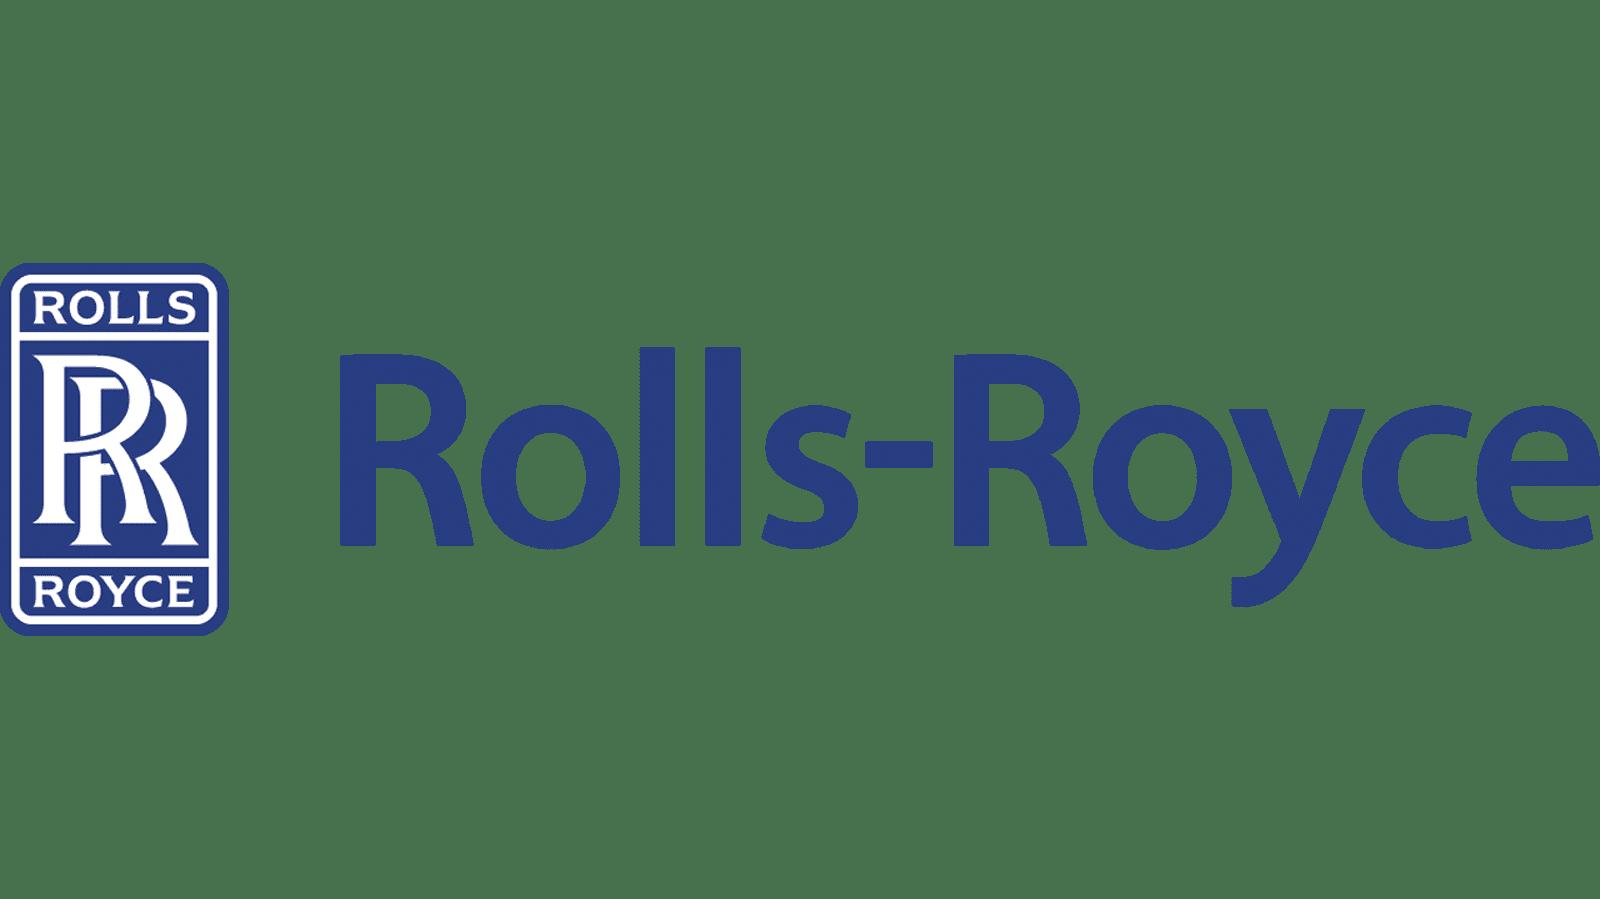 Rolls-Royce Symbol